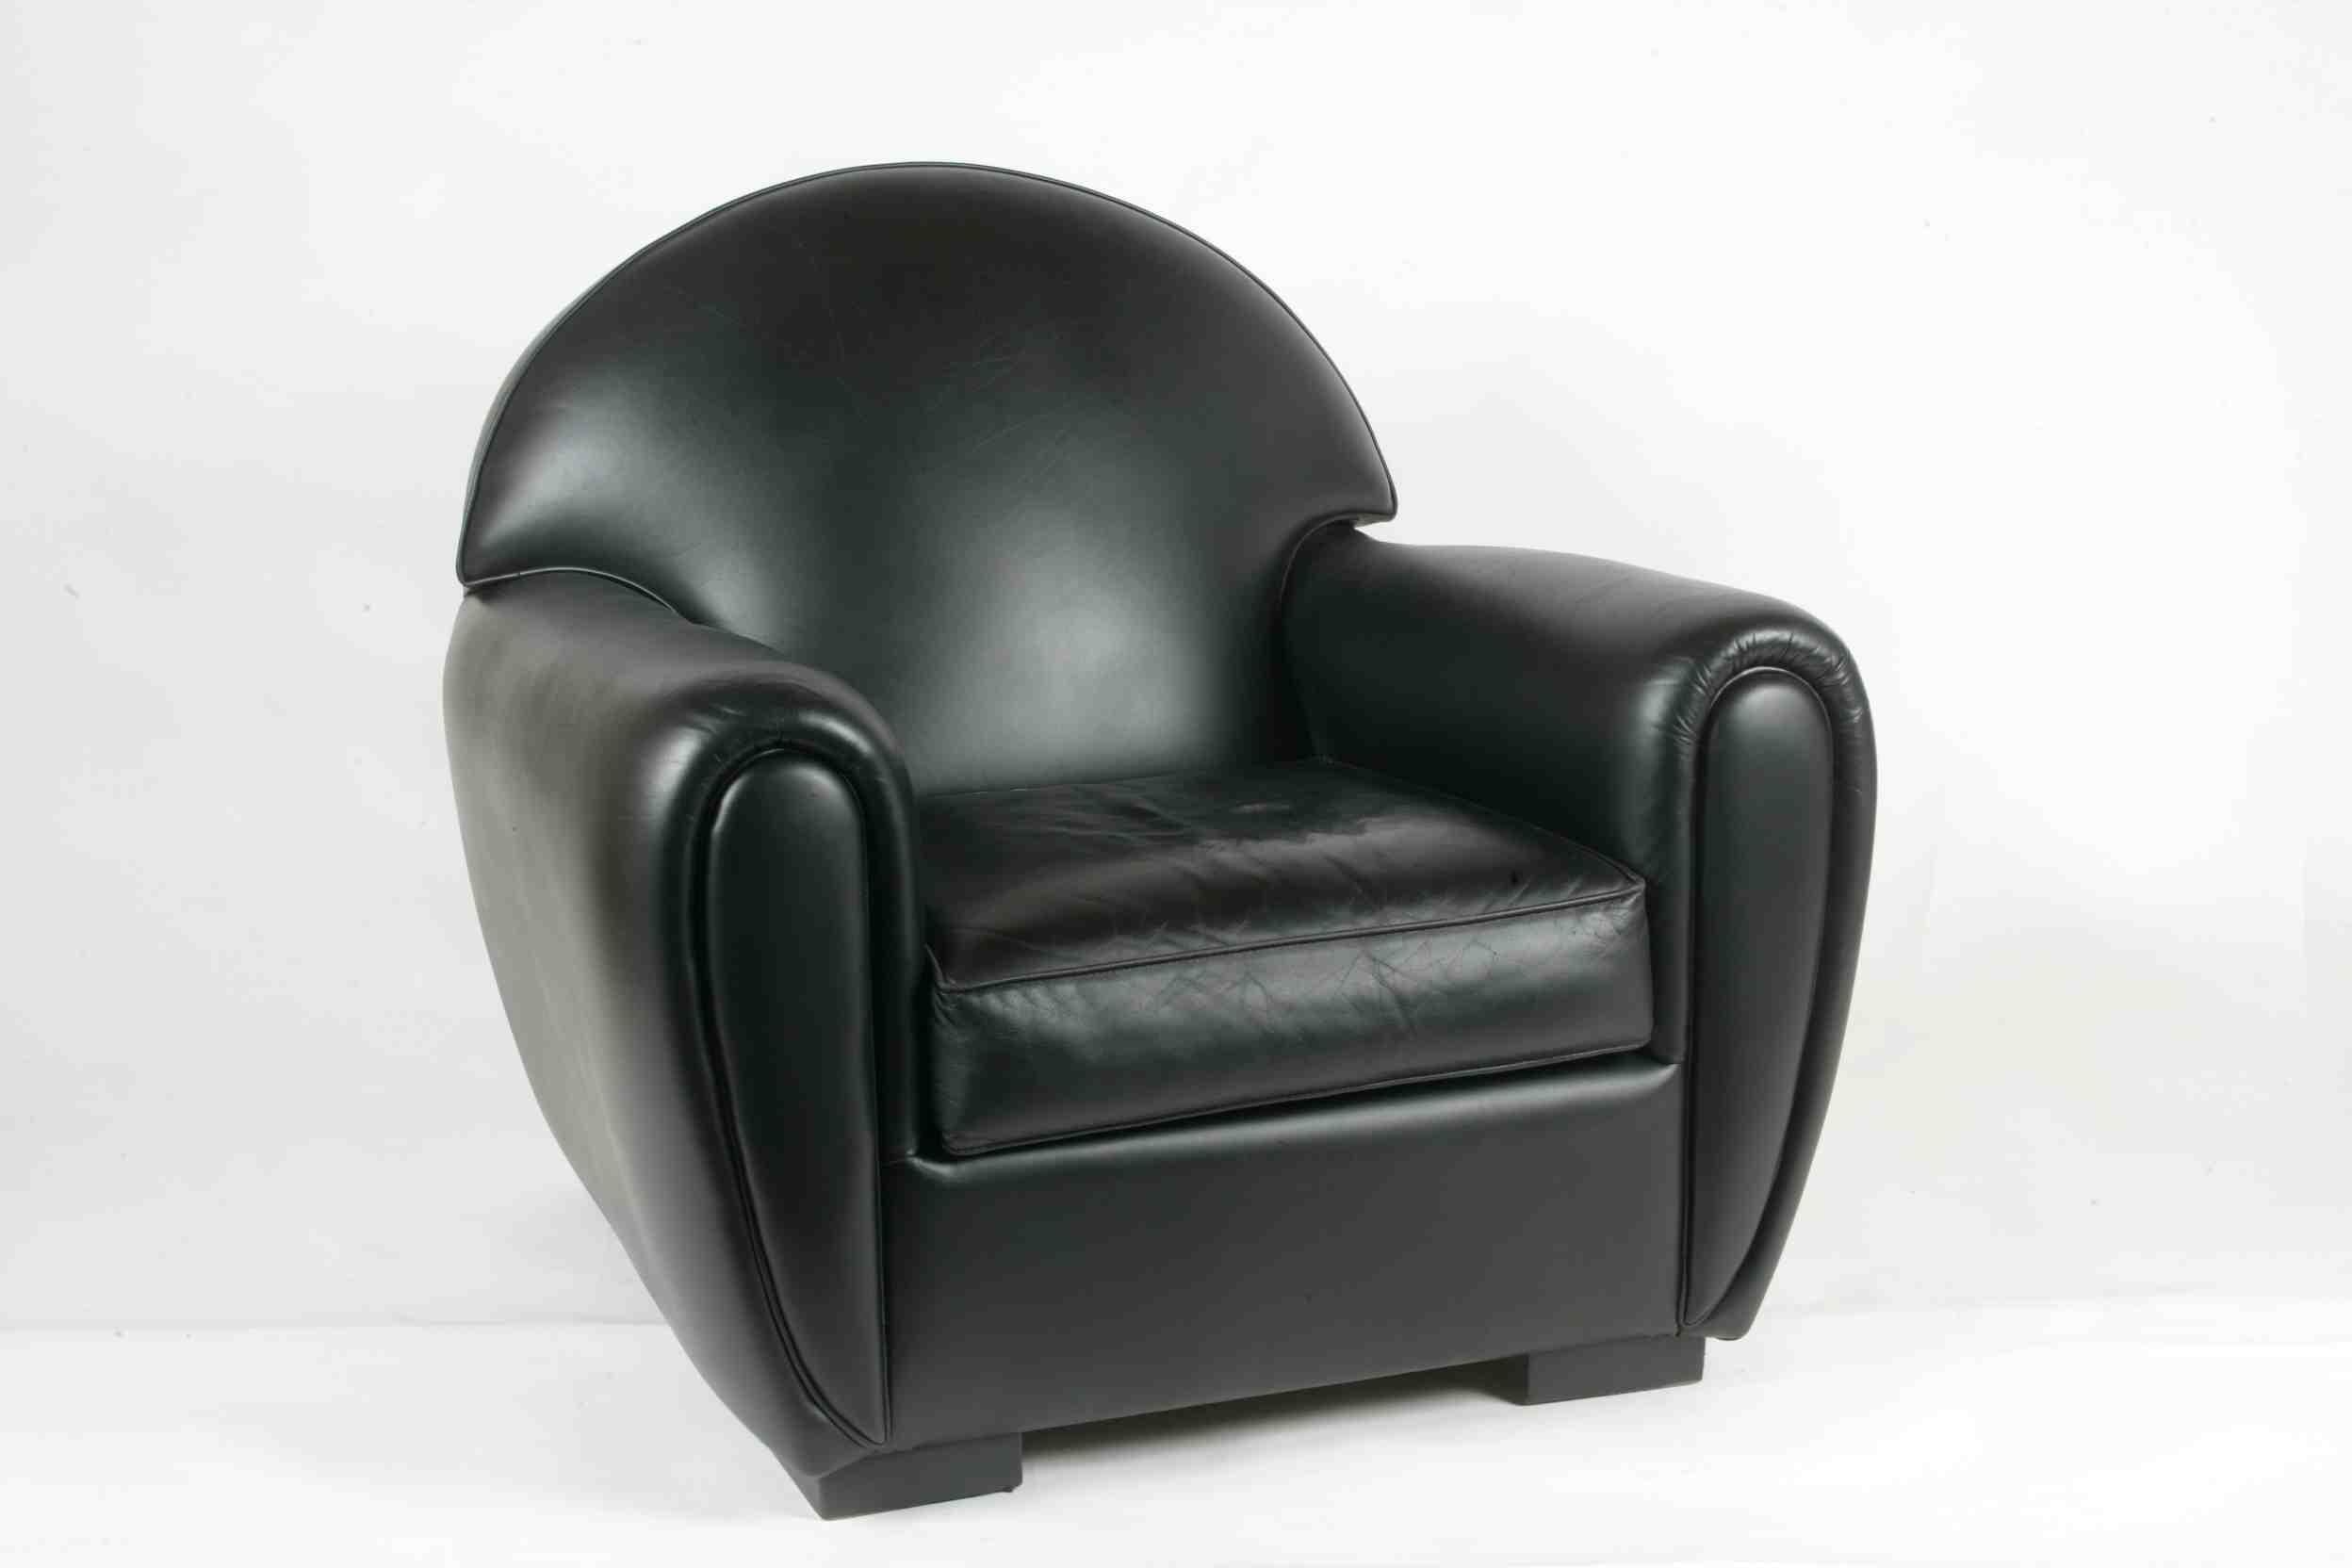 fauteuil en cuir propre